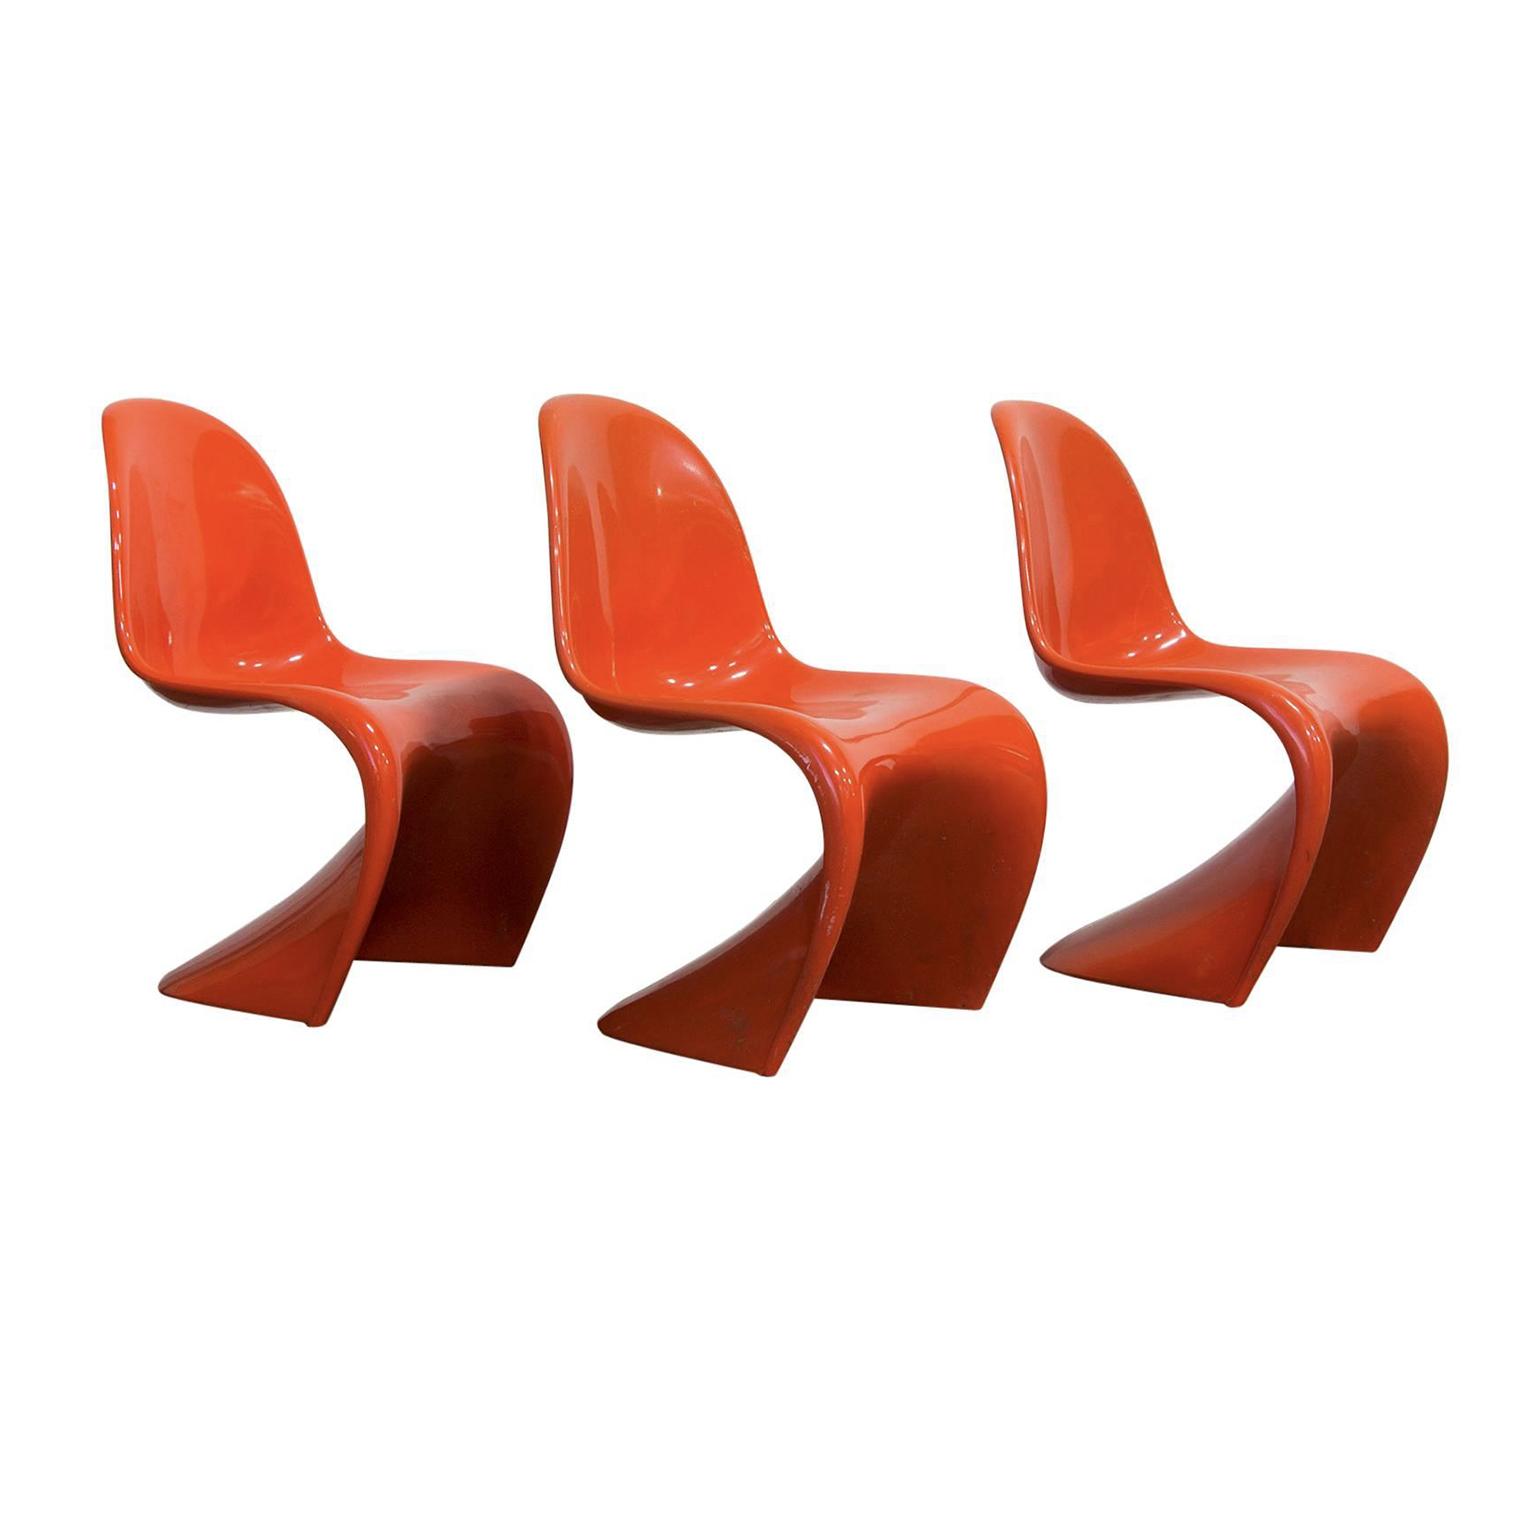 1965 Verner Panton Stacking Chair First Herman Miller Edition In Orange